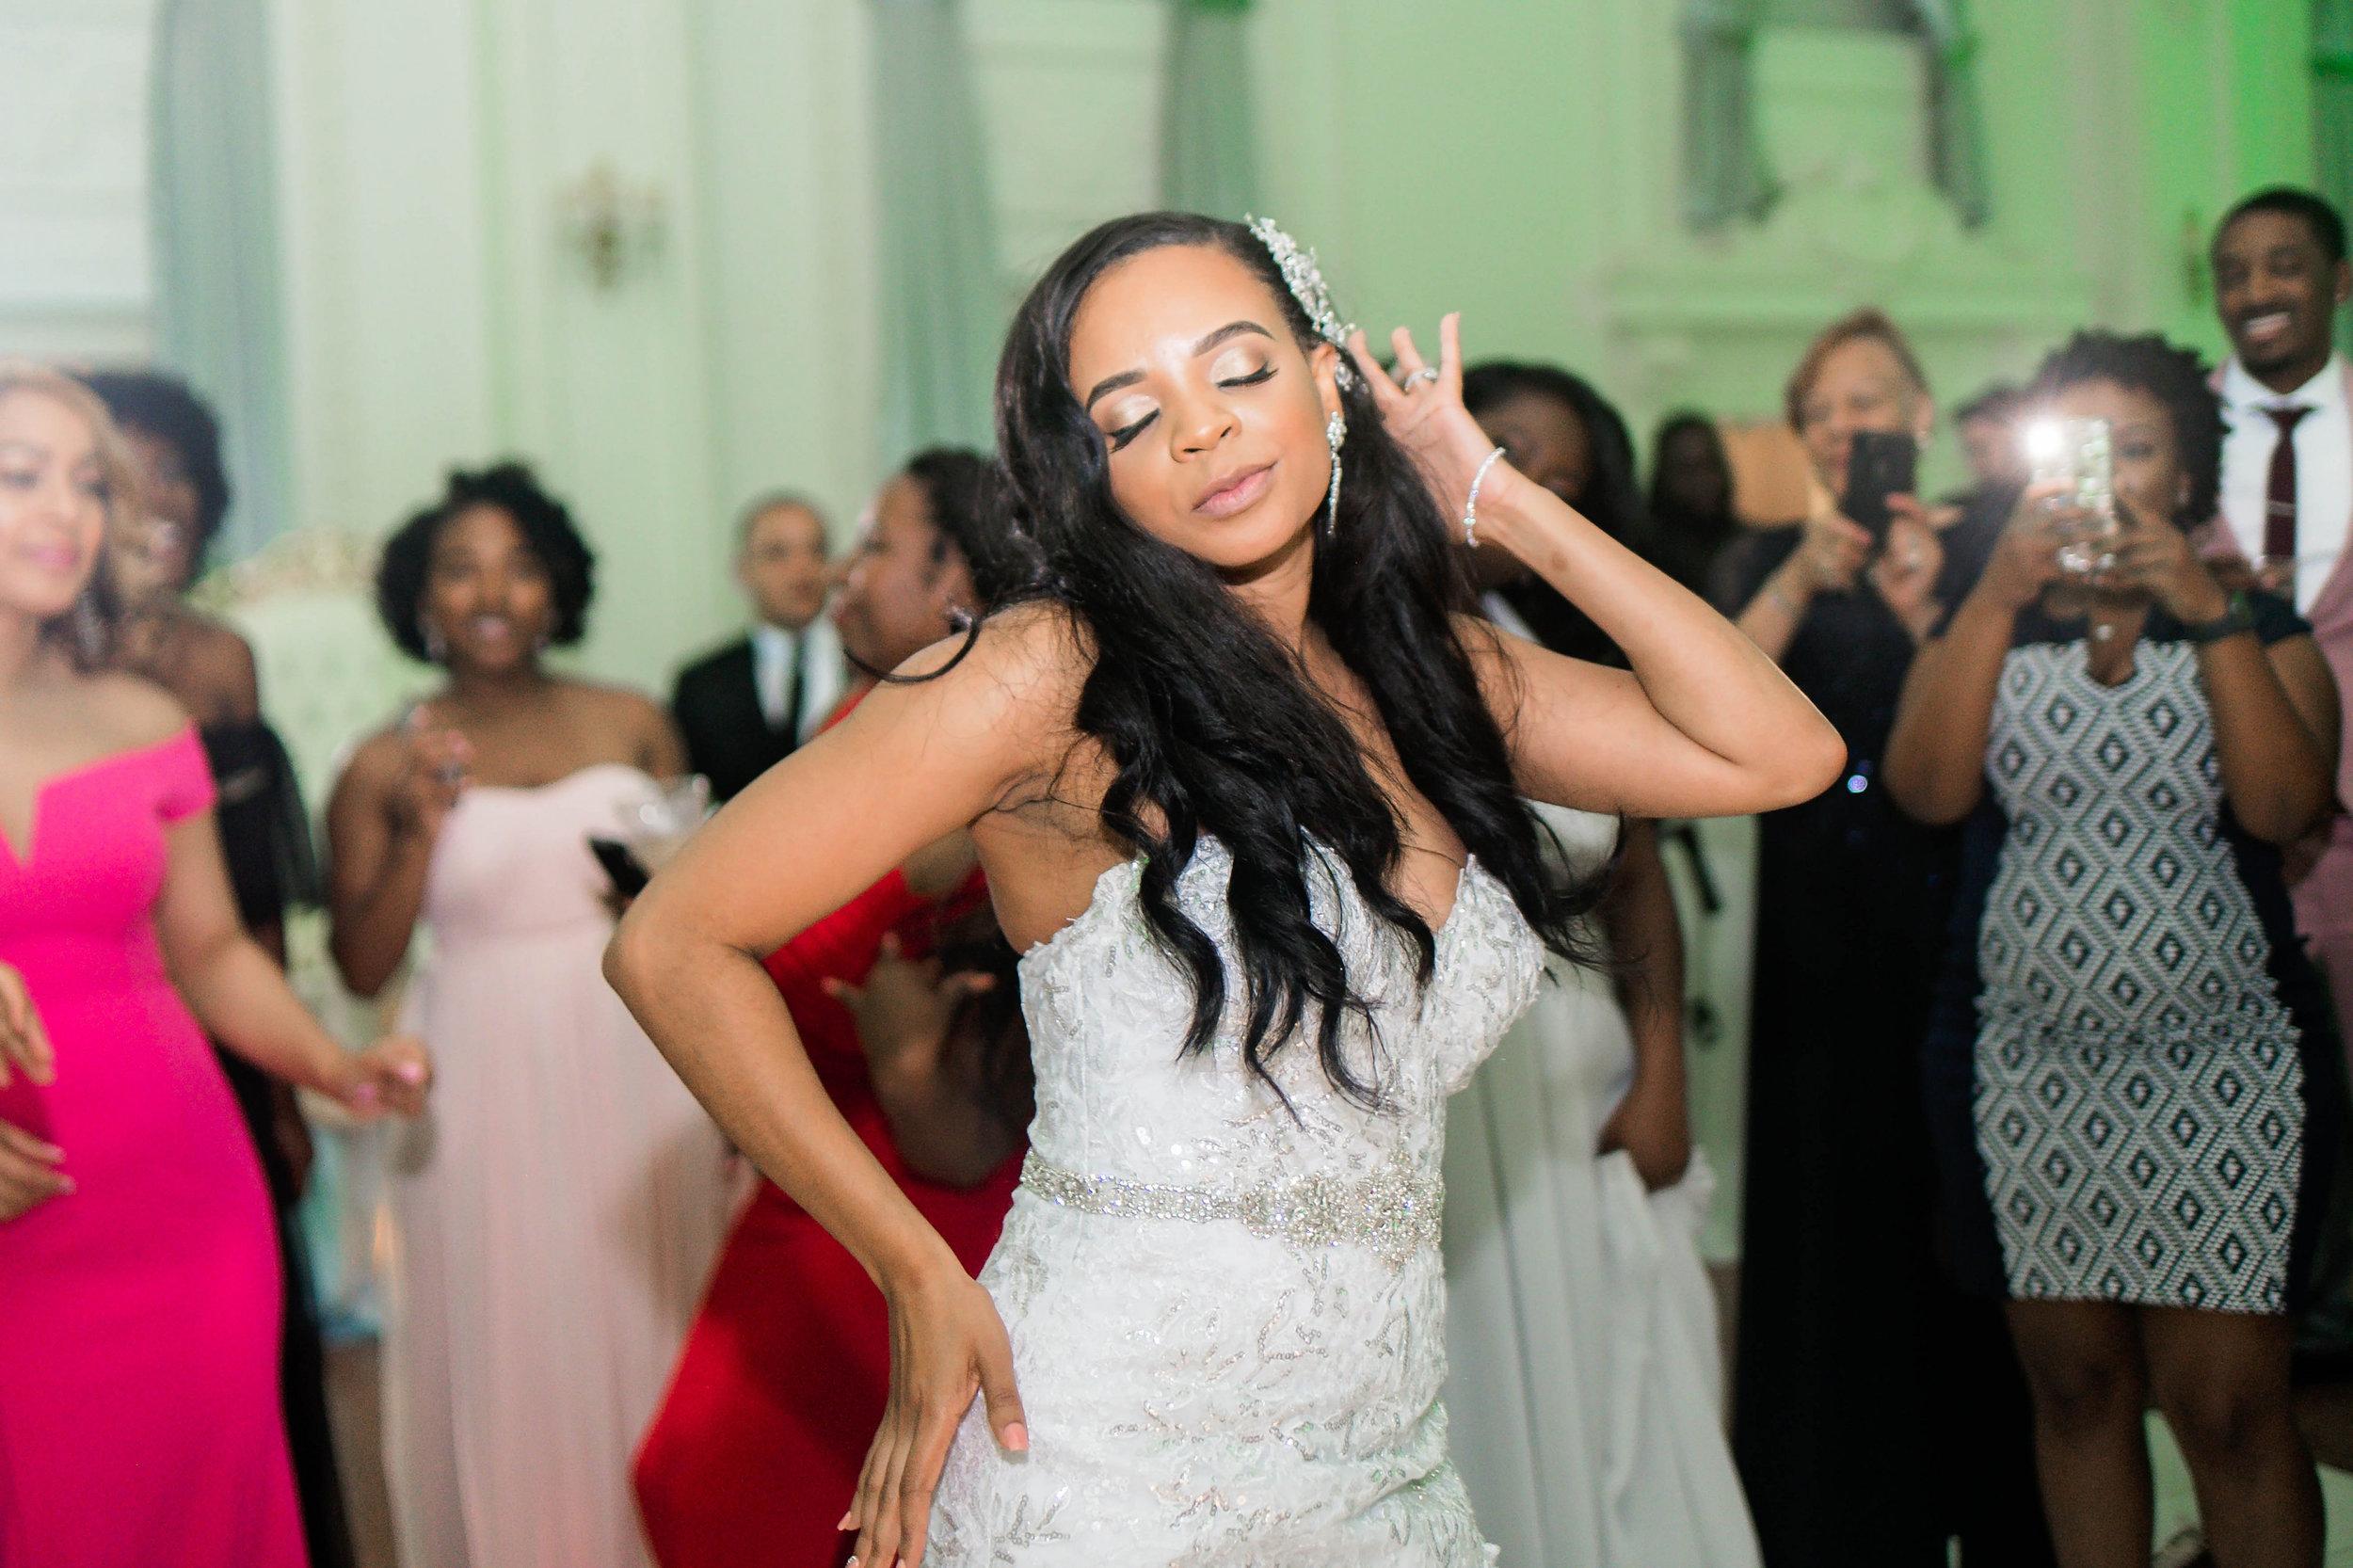 Tulsa Wedding- Pharris Photography- Reception- Darla + Quinton- Dance Floor- Bride